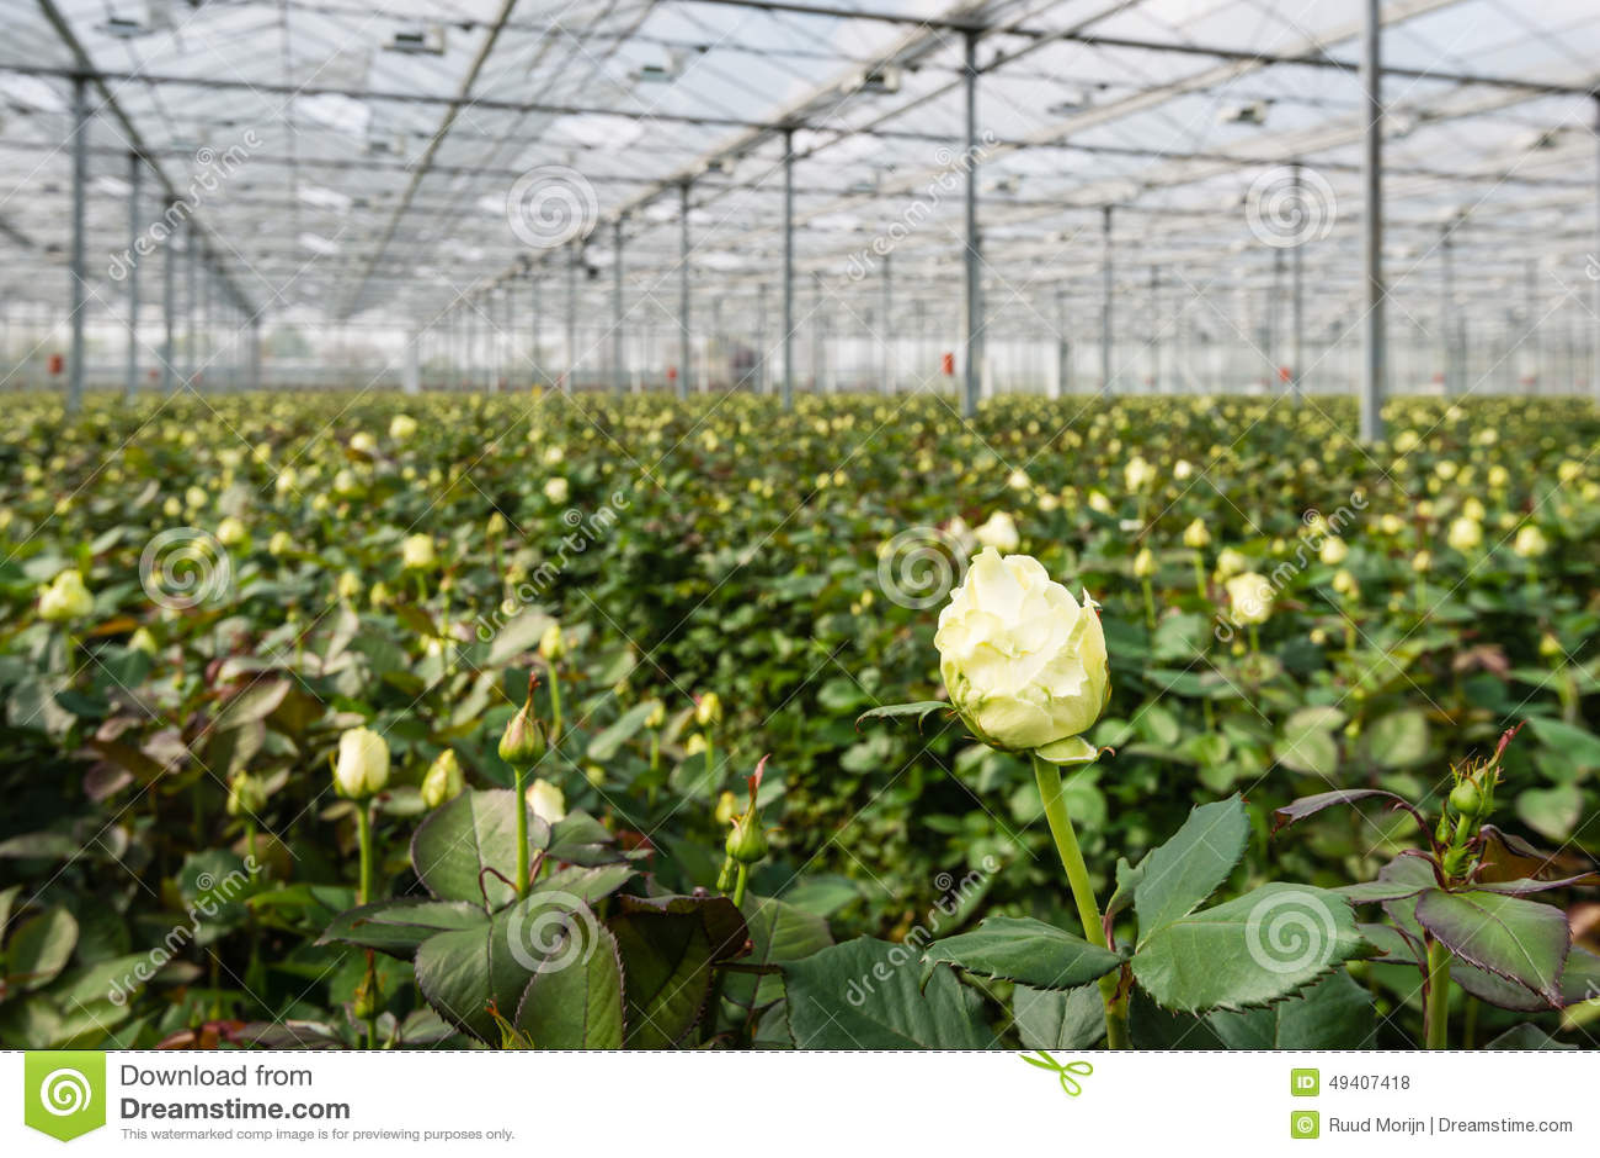 Cut flower farming business plan